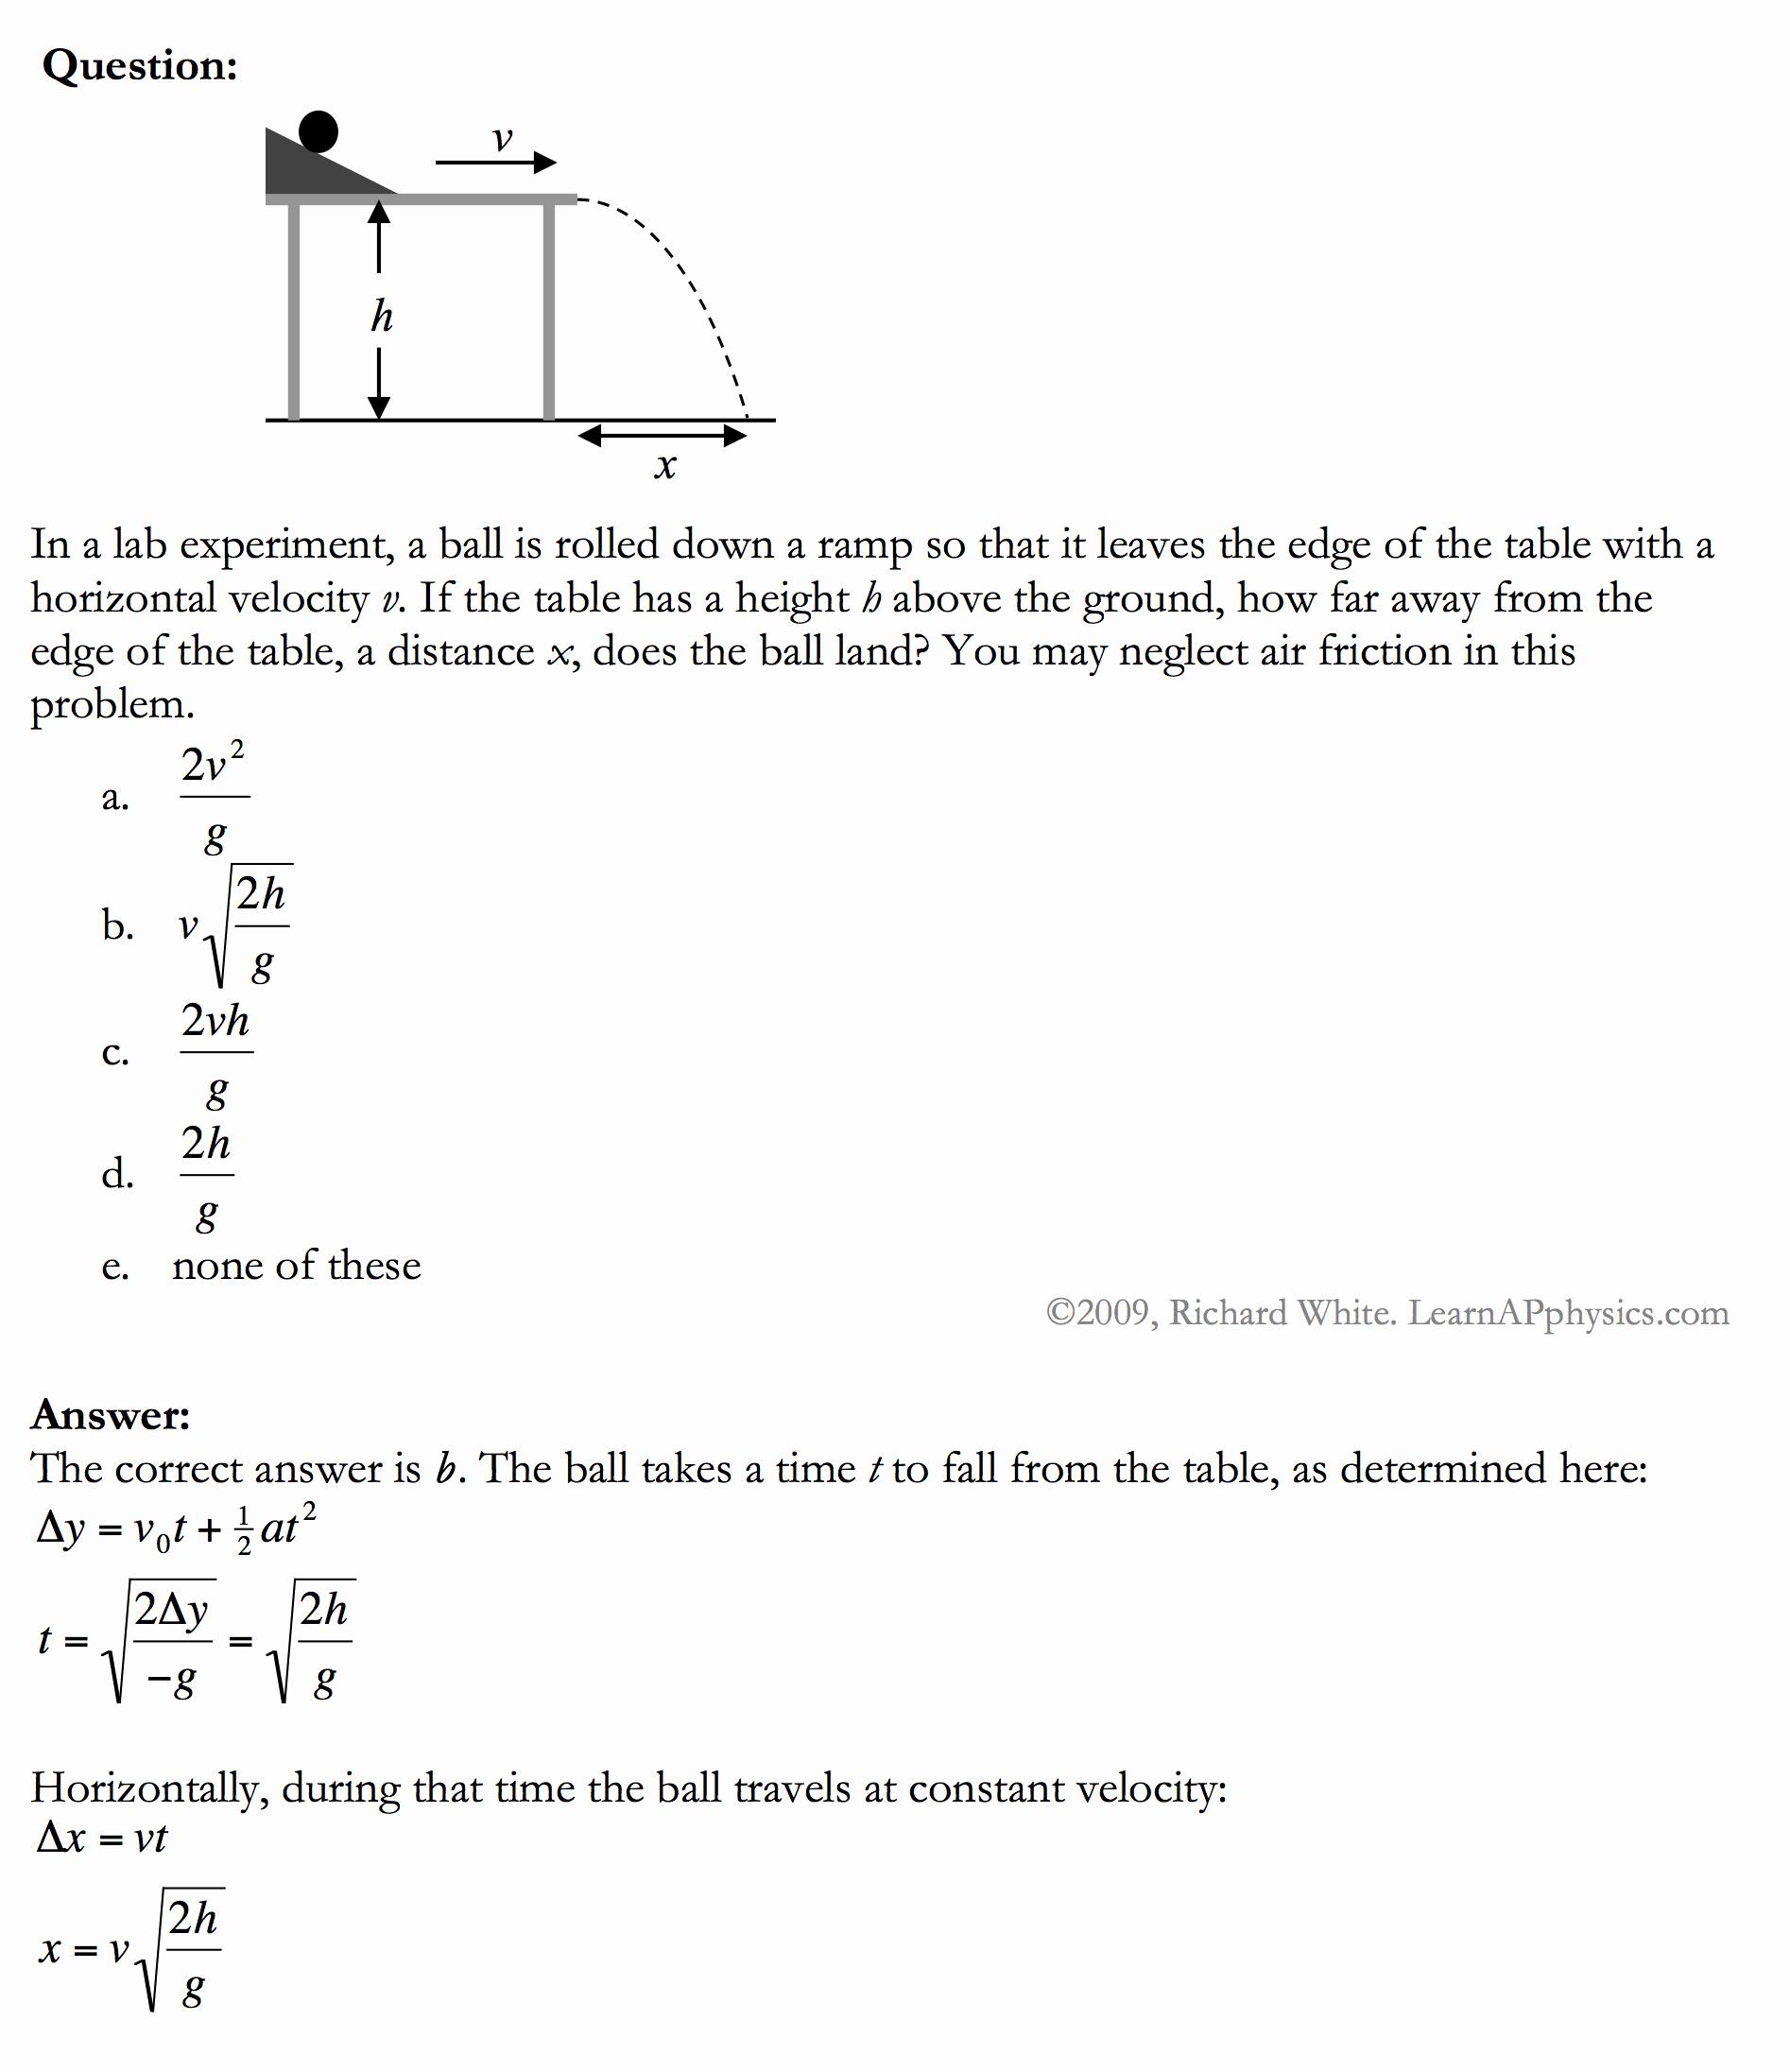 Kinematics Practice Problems Worksheet Inspirational Learn Ap Physics Ap Physics 1 & 2 Kinematics